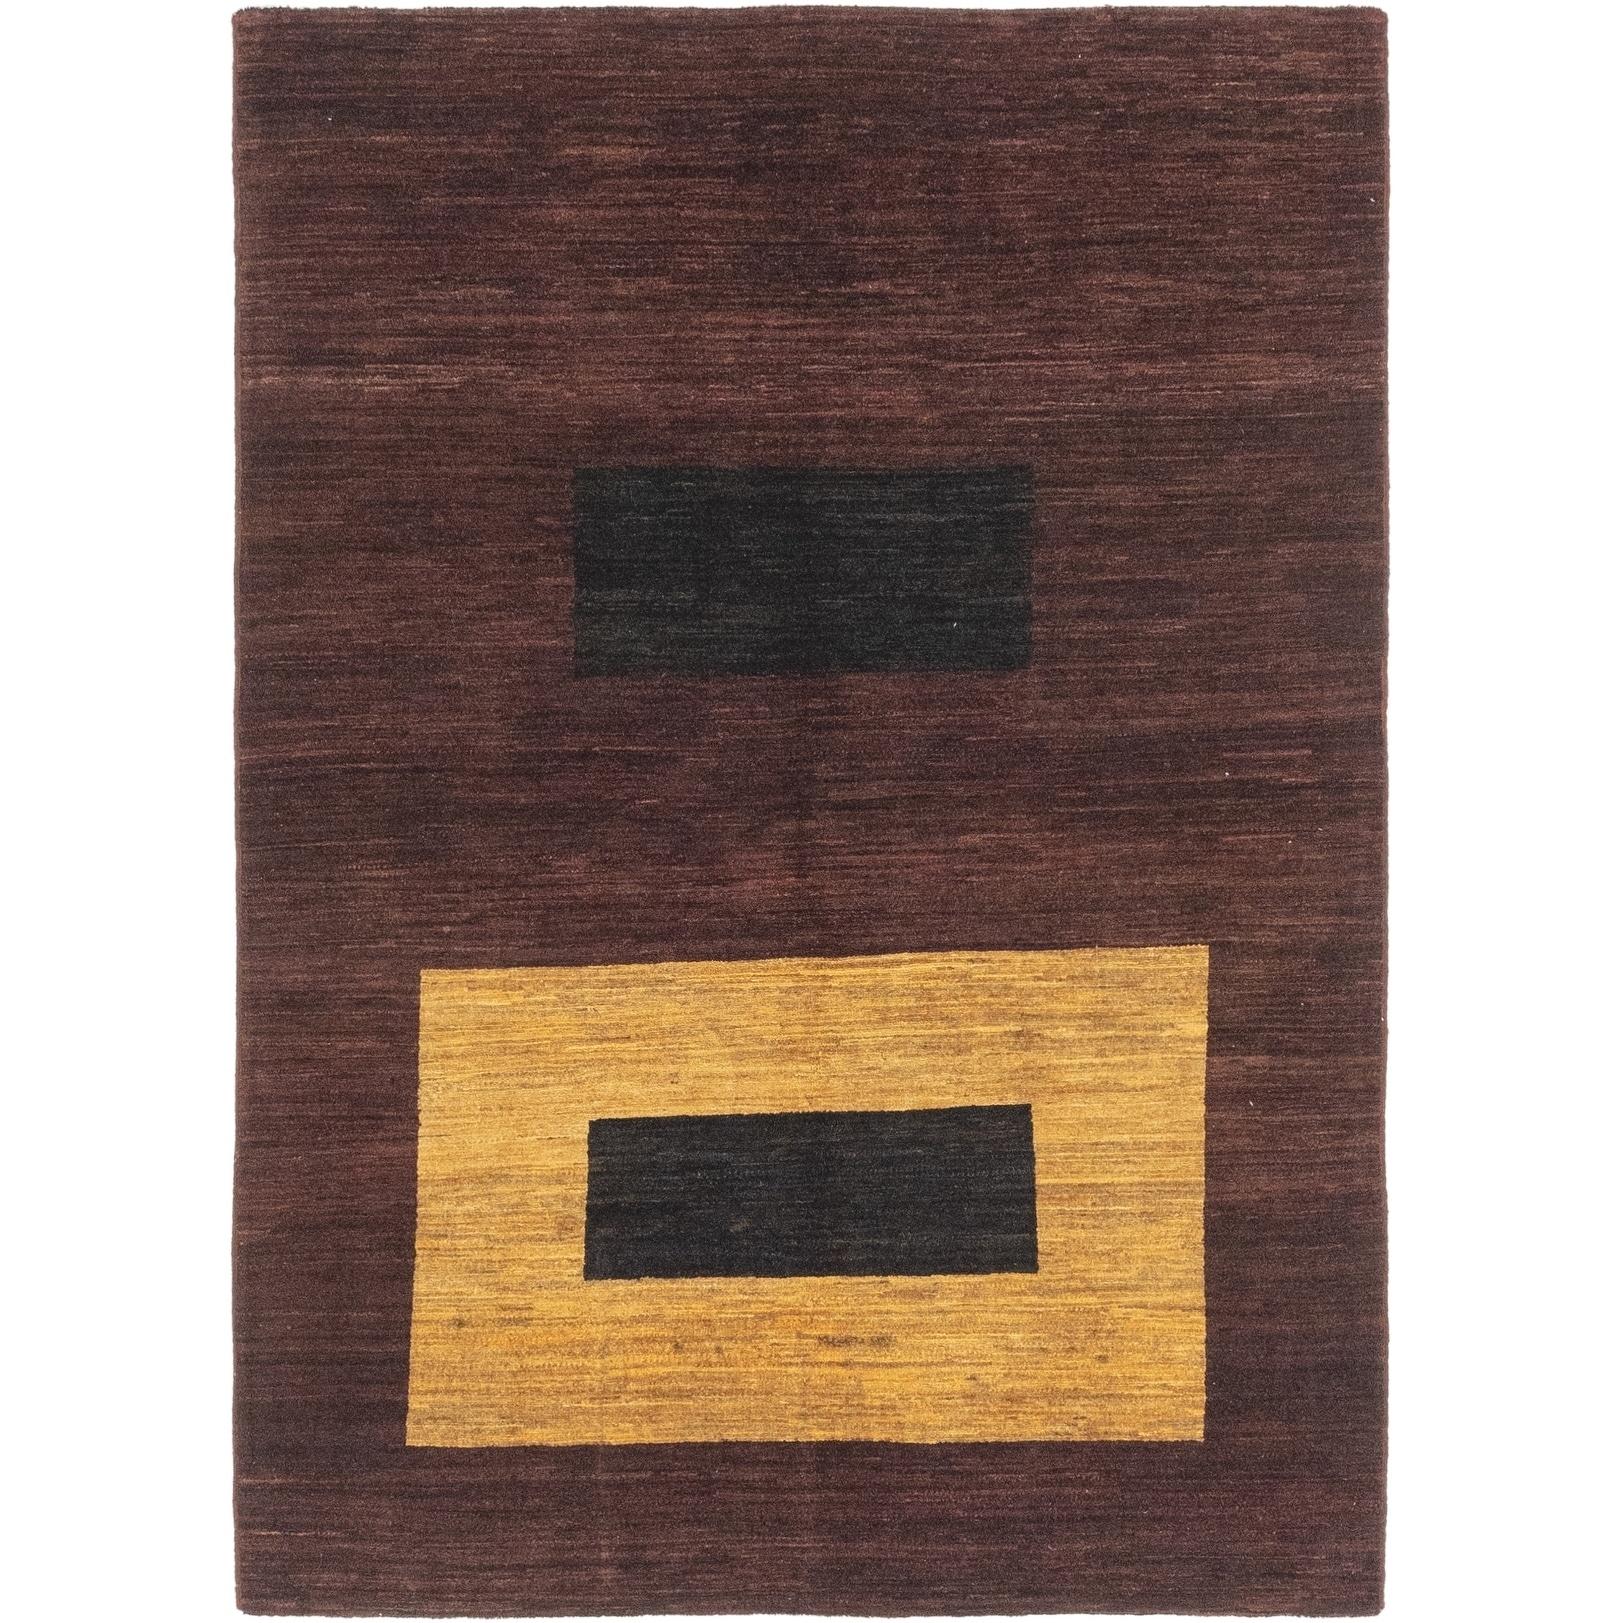 Hand Knotted Kashkuli Gabbeh Wool Area Rug - 4 9 x 6 8 (Burgundy - 4 9 x 6 8)